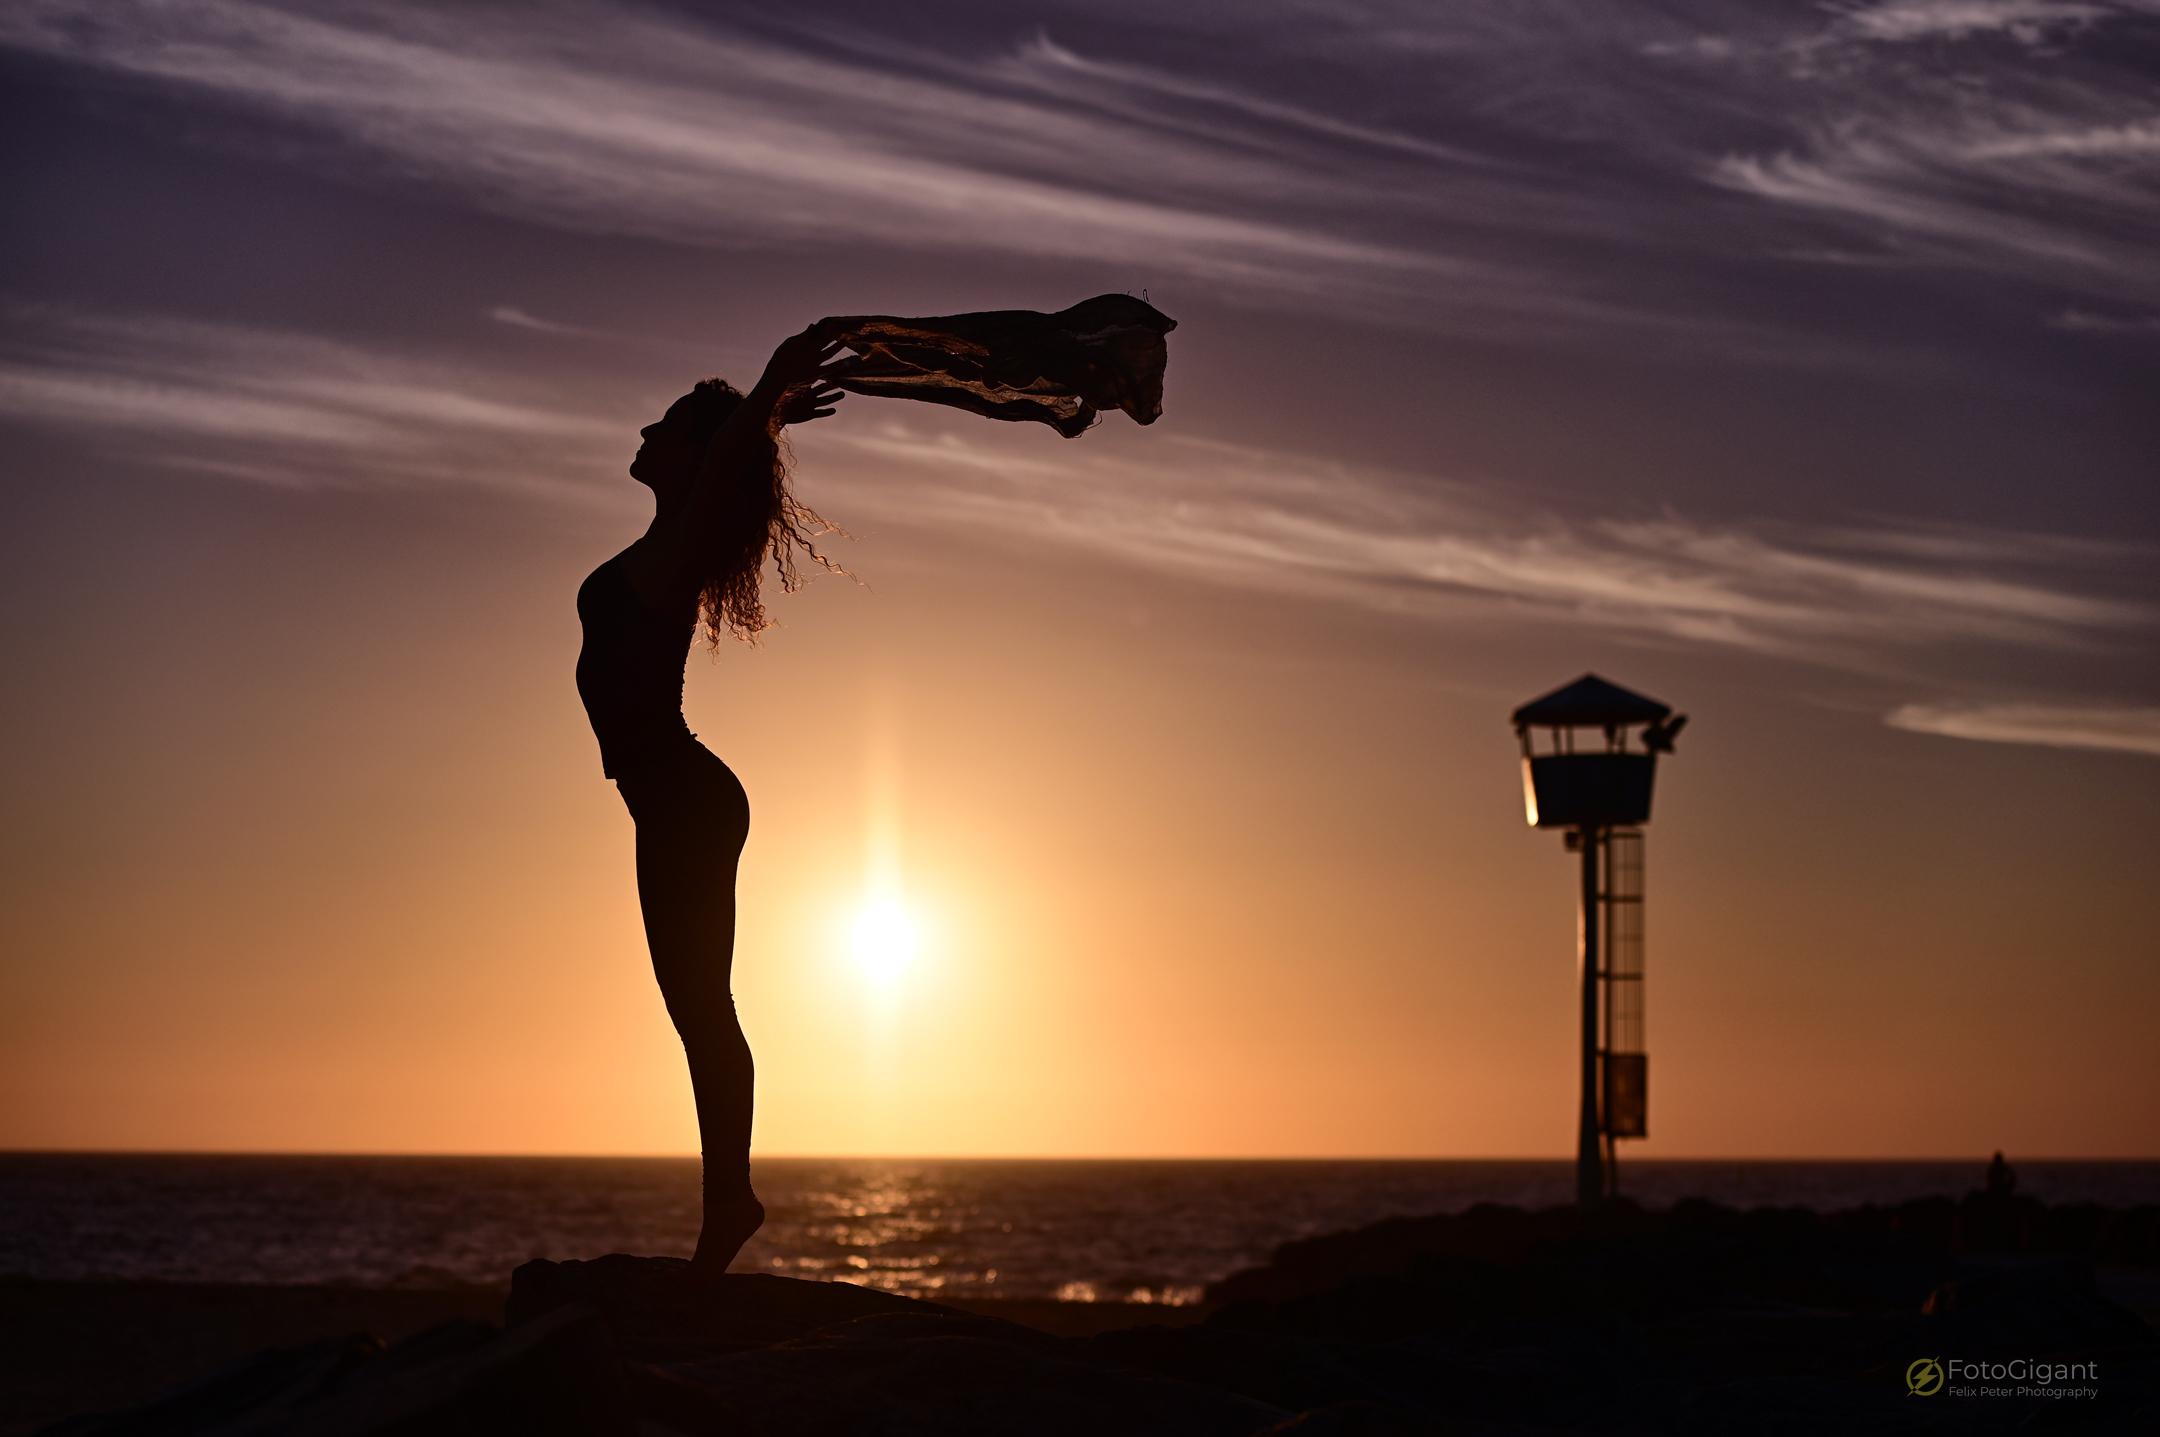 Pilates_Yoga_Silhouettes_03.jpg